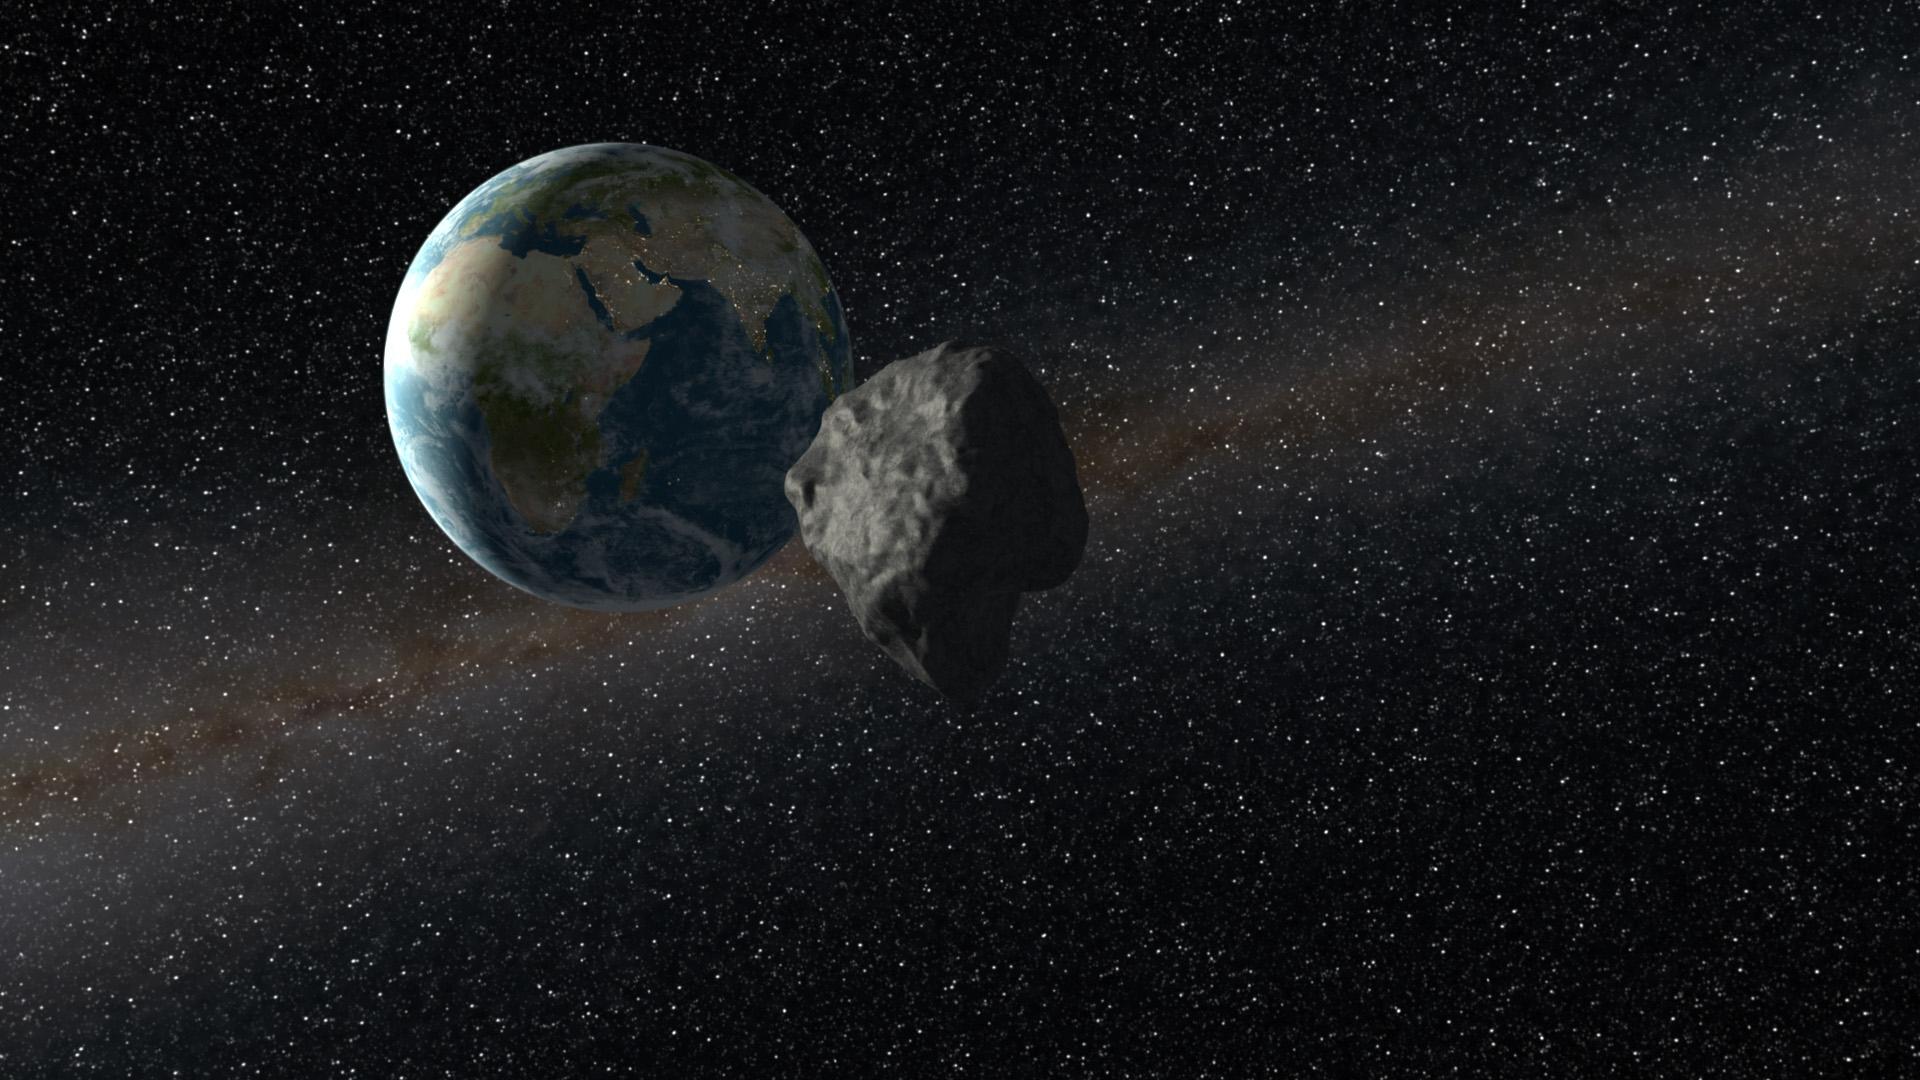 Обои обломки, астероиды, земля. Космос foto 10